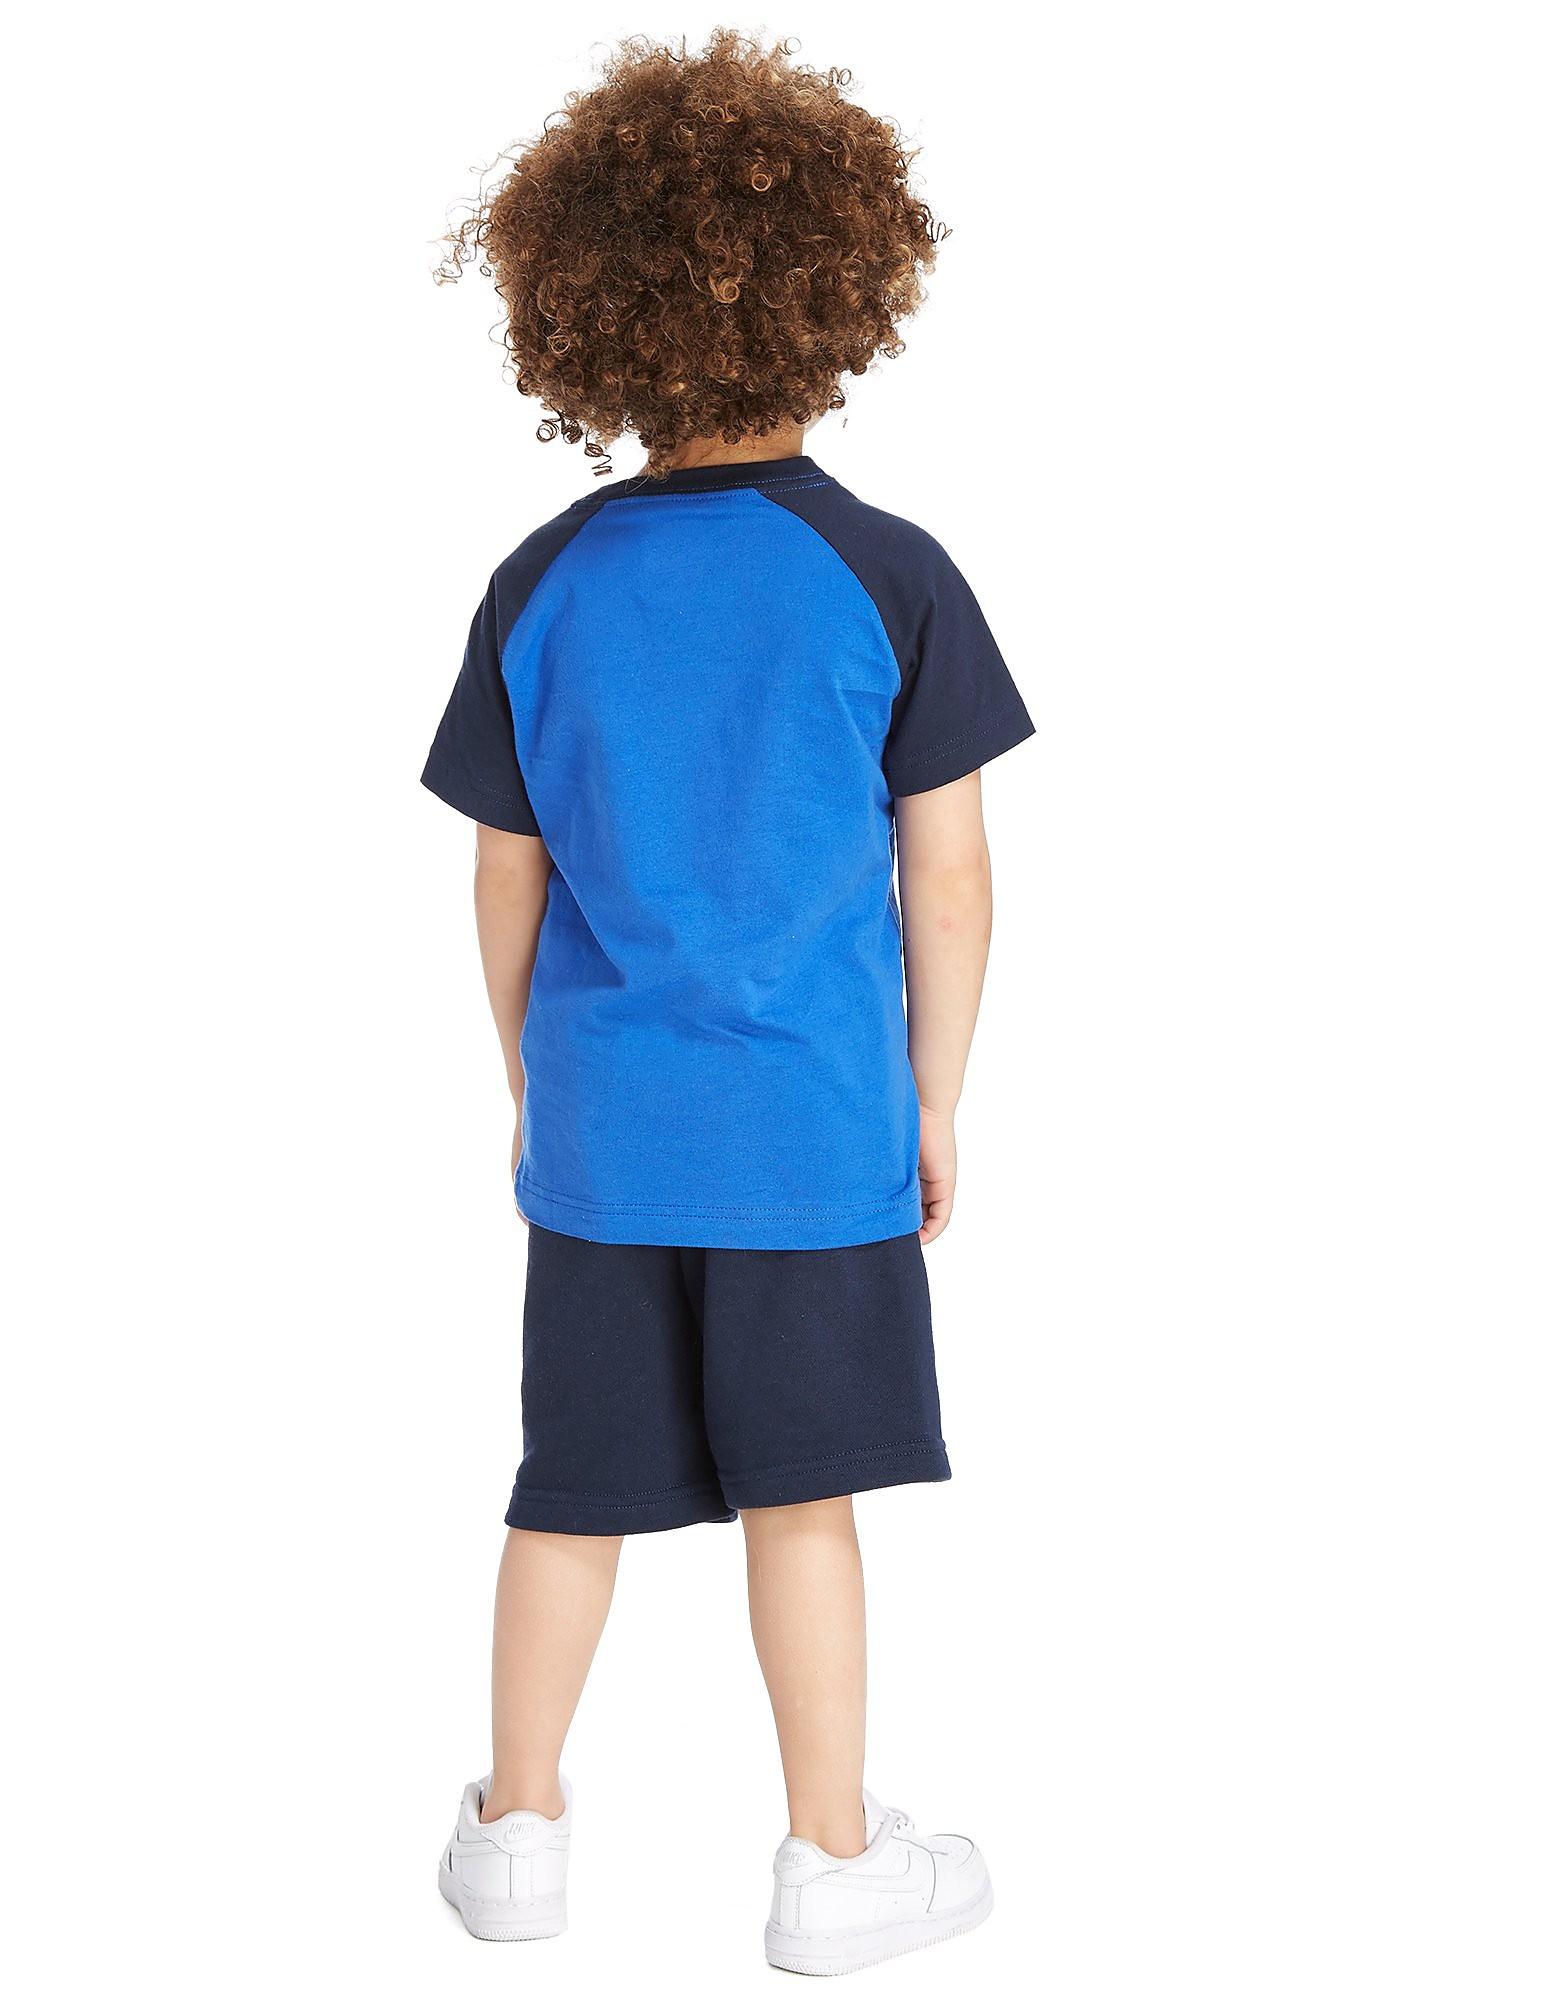 Nike T-Shirt & Short Set Children